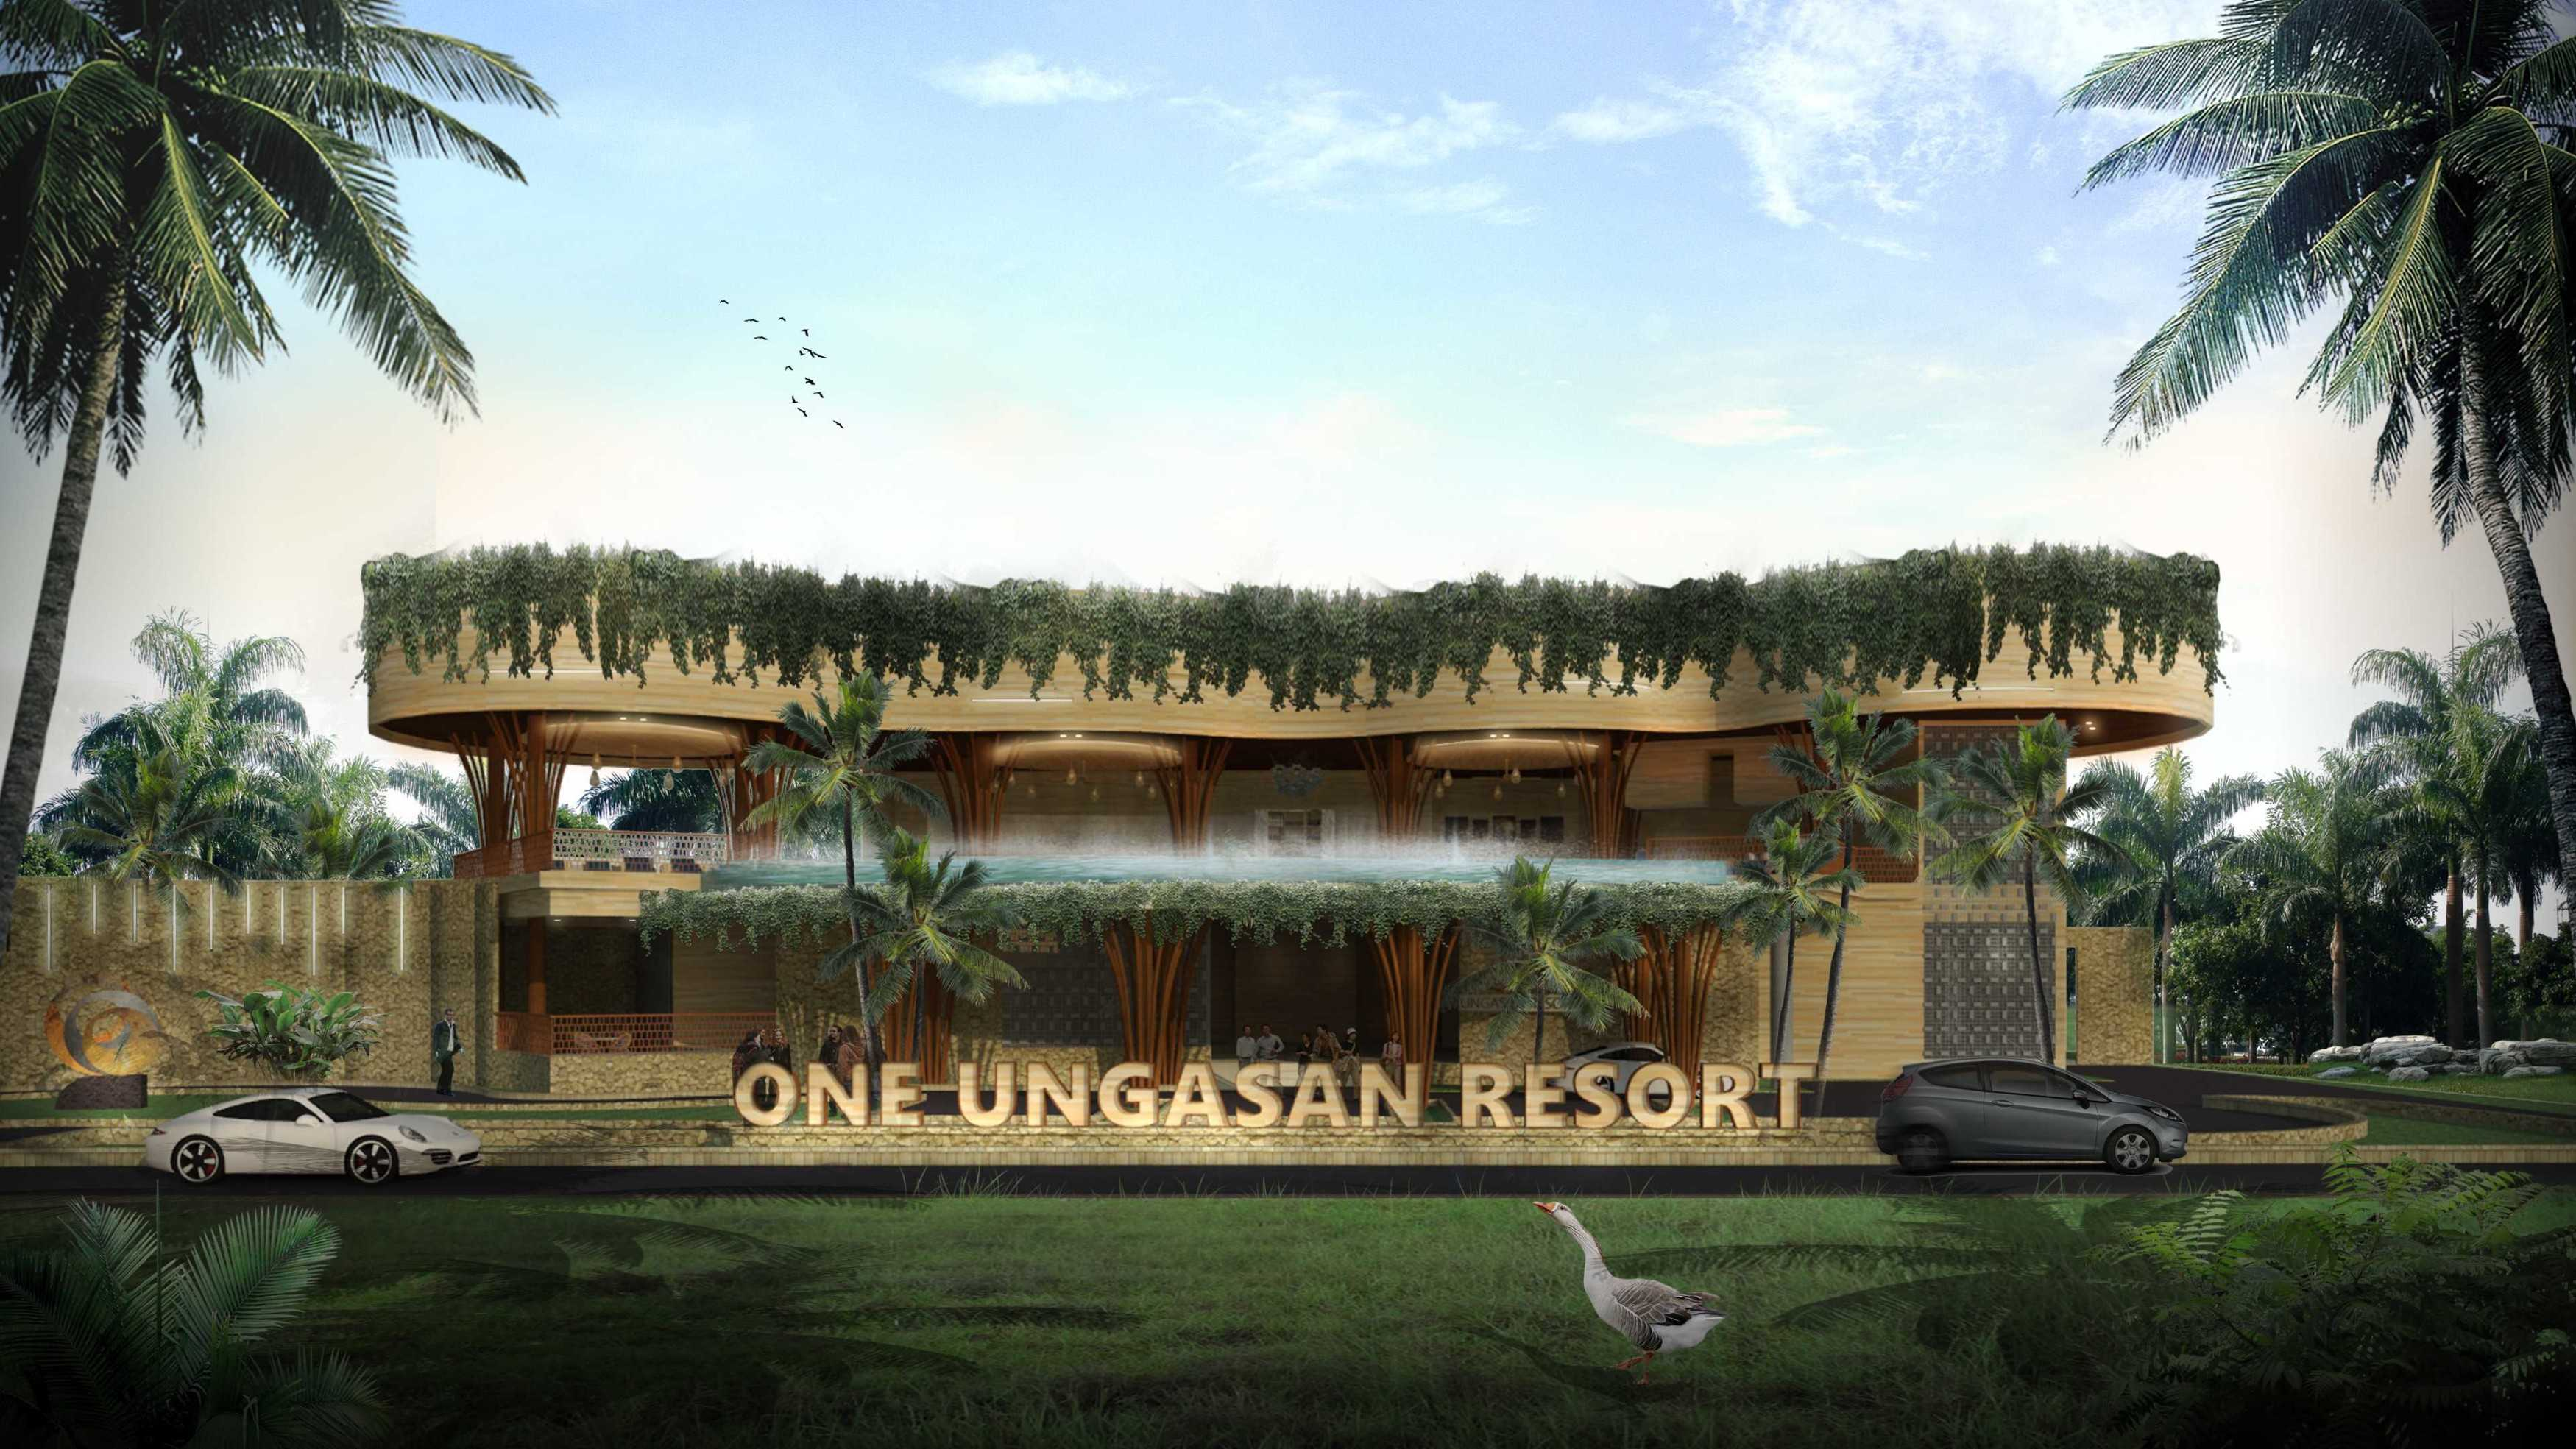 Alima Studio One Ungasan Resort Ungasan, Kuta Sel., Kabupaten Badung, Bali, Indonesia Ungasan, Kuta Sel., Kabupaten Badung, Bali, Indonesia Alima-Studio-One-Ungasan-Resort   57470